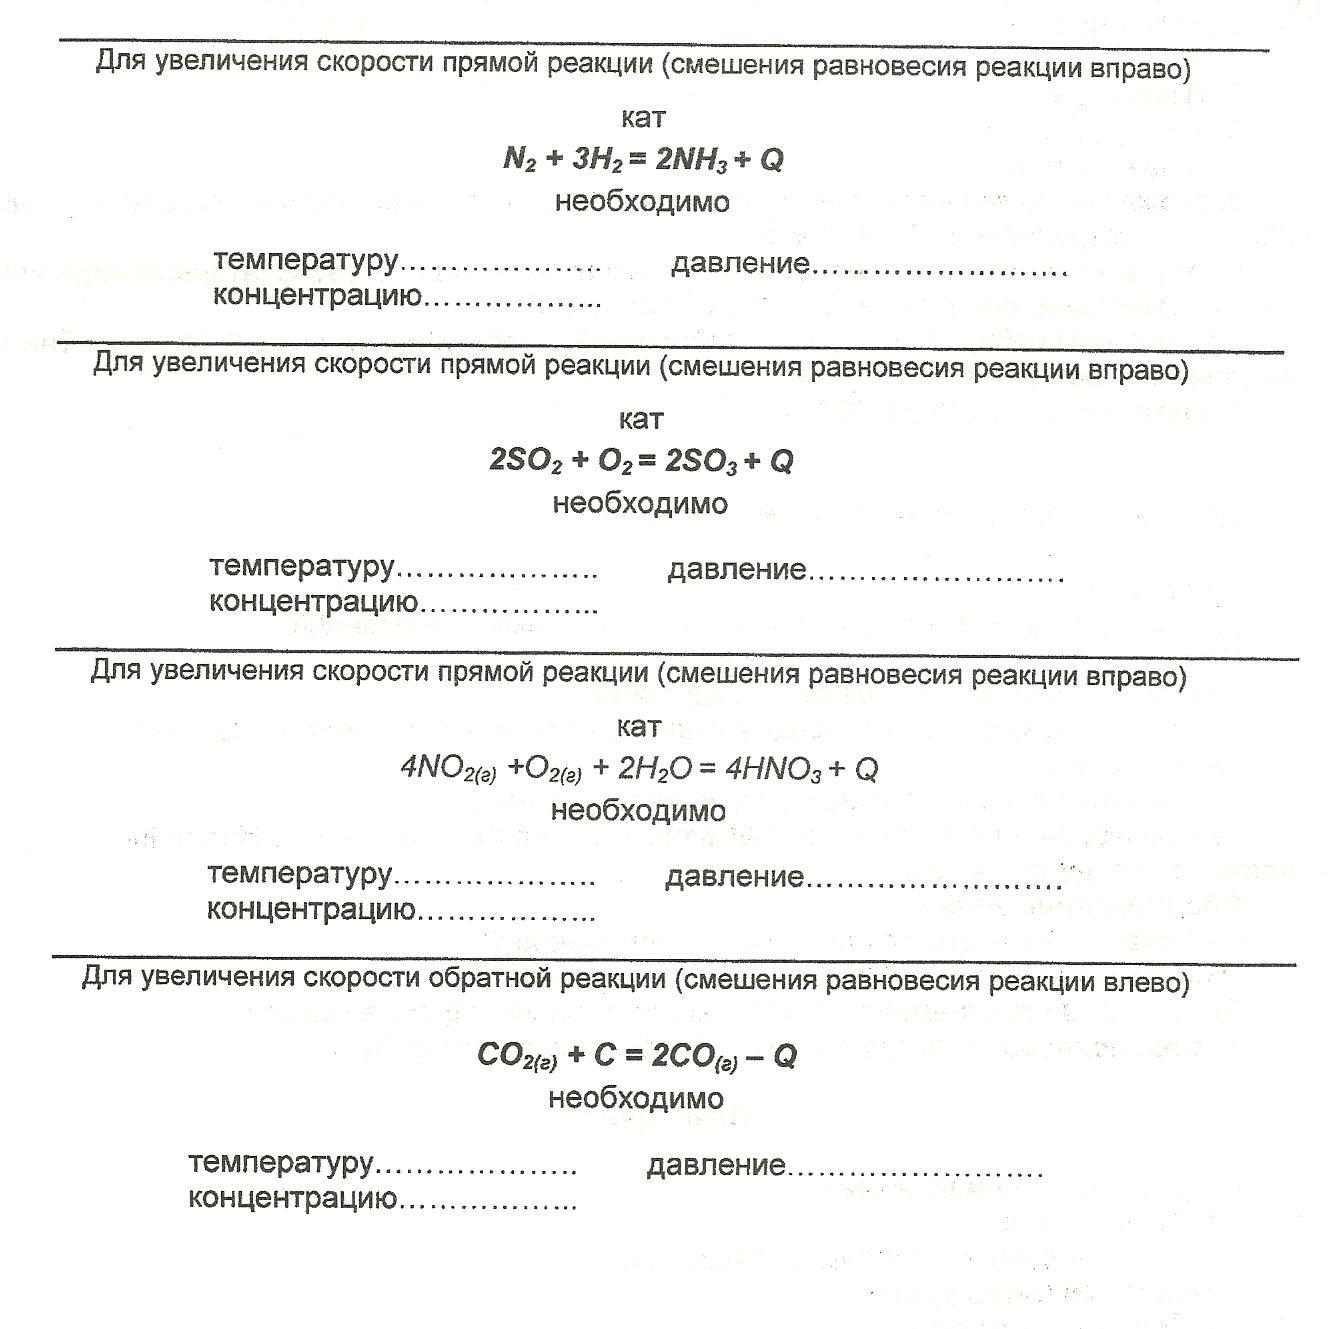 C:\Documents and Settings\Завуч\Мои документы\Мои рисунки\Изображение\Копия Изображение 004.jpg